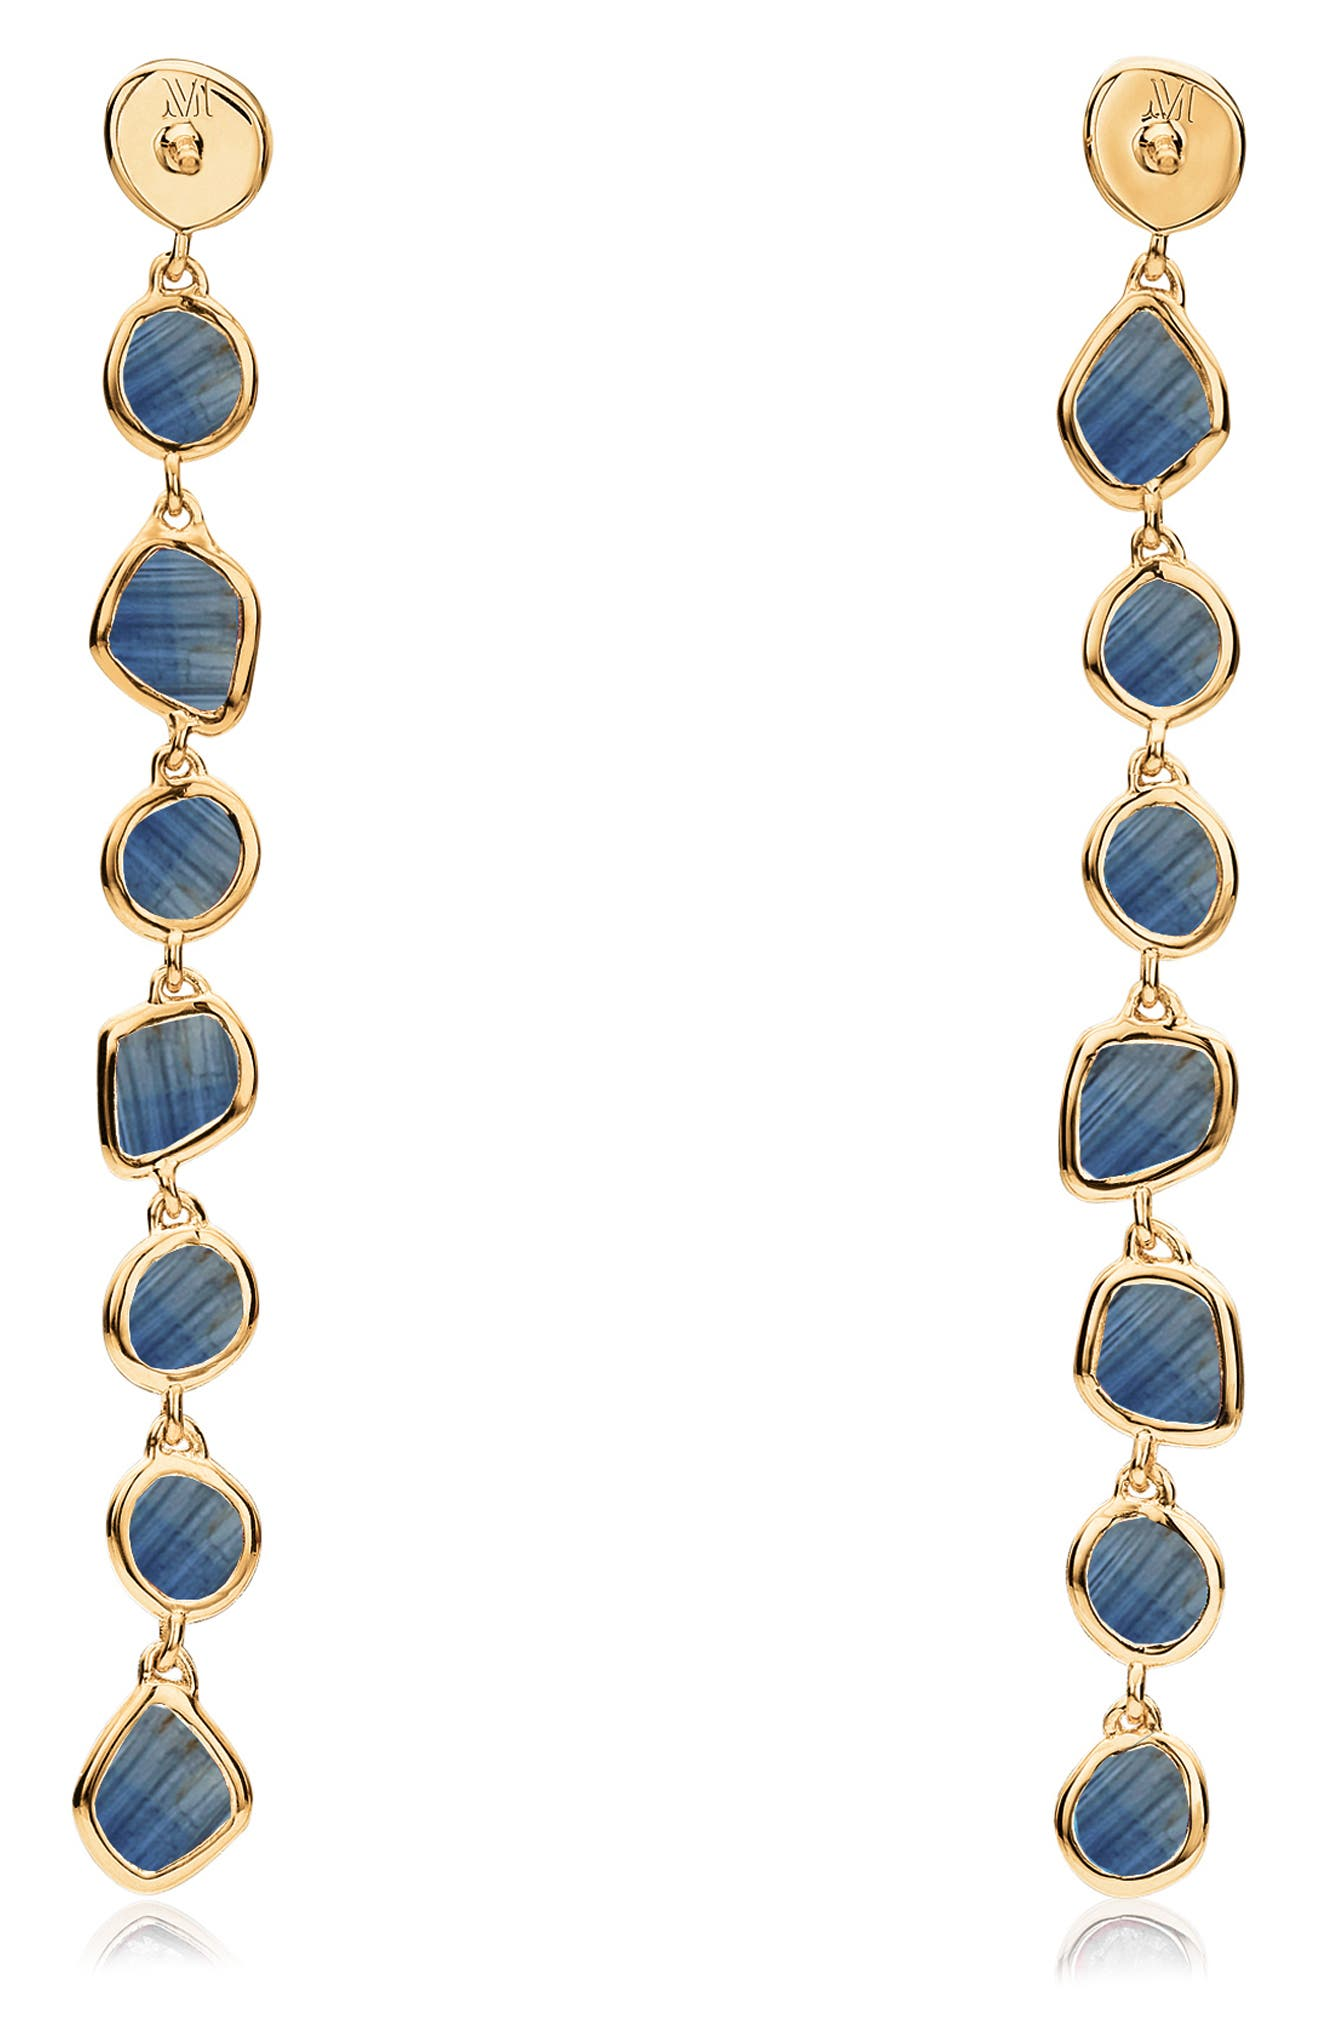 Siren Mini Nugget Earrings,                             Alternate thumbnail 3, color,                             GOLD/ KYANITE